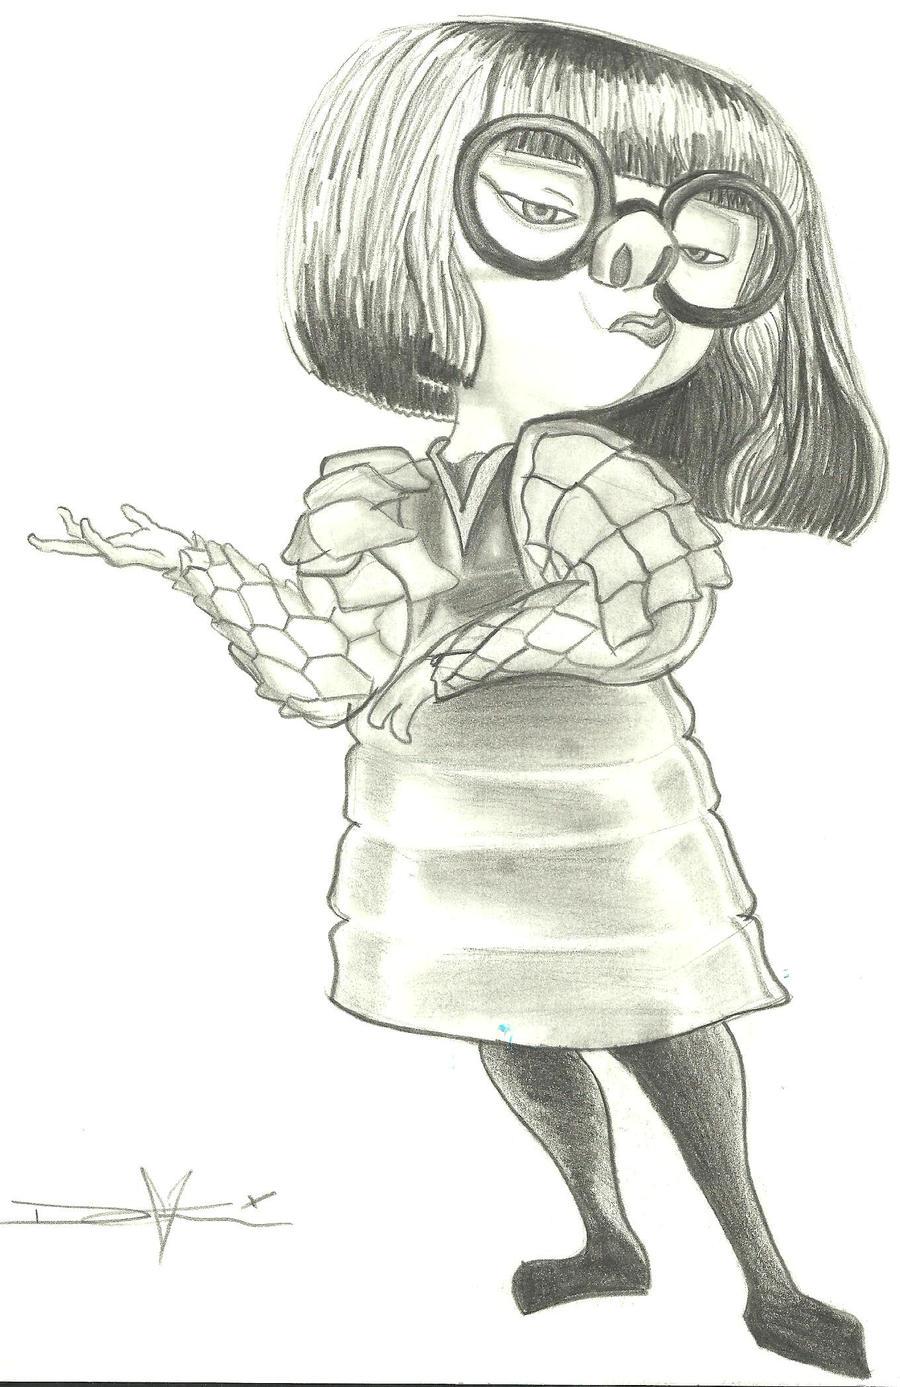 Edna Mode -The Incredibles by Stencilgirl on DeviantArt